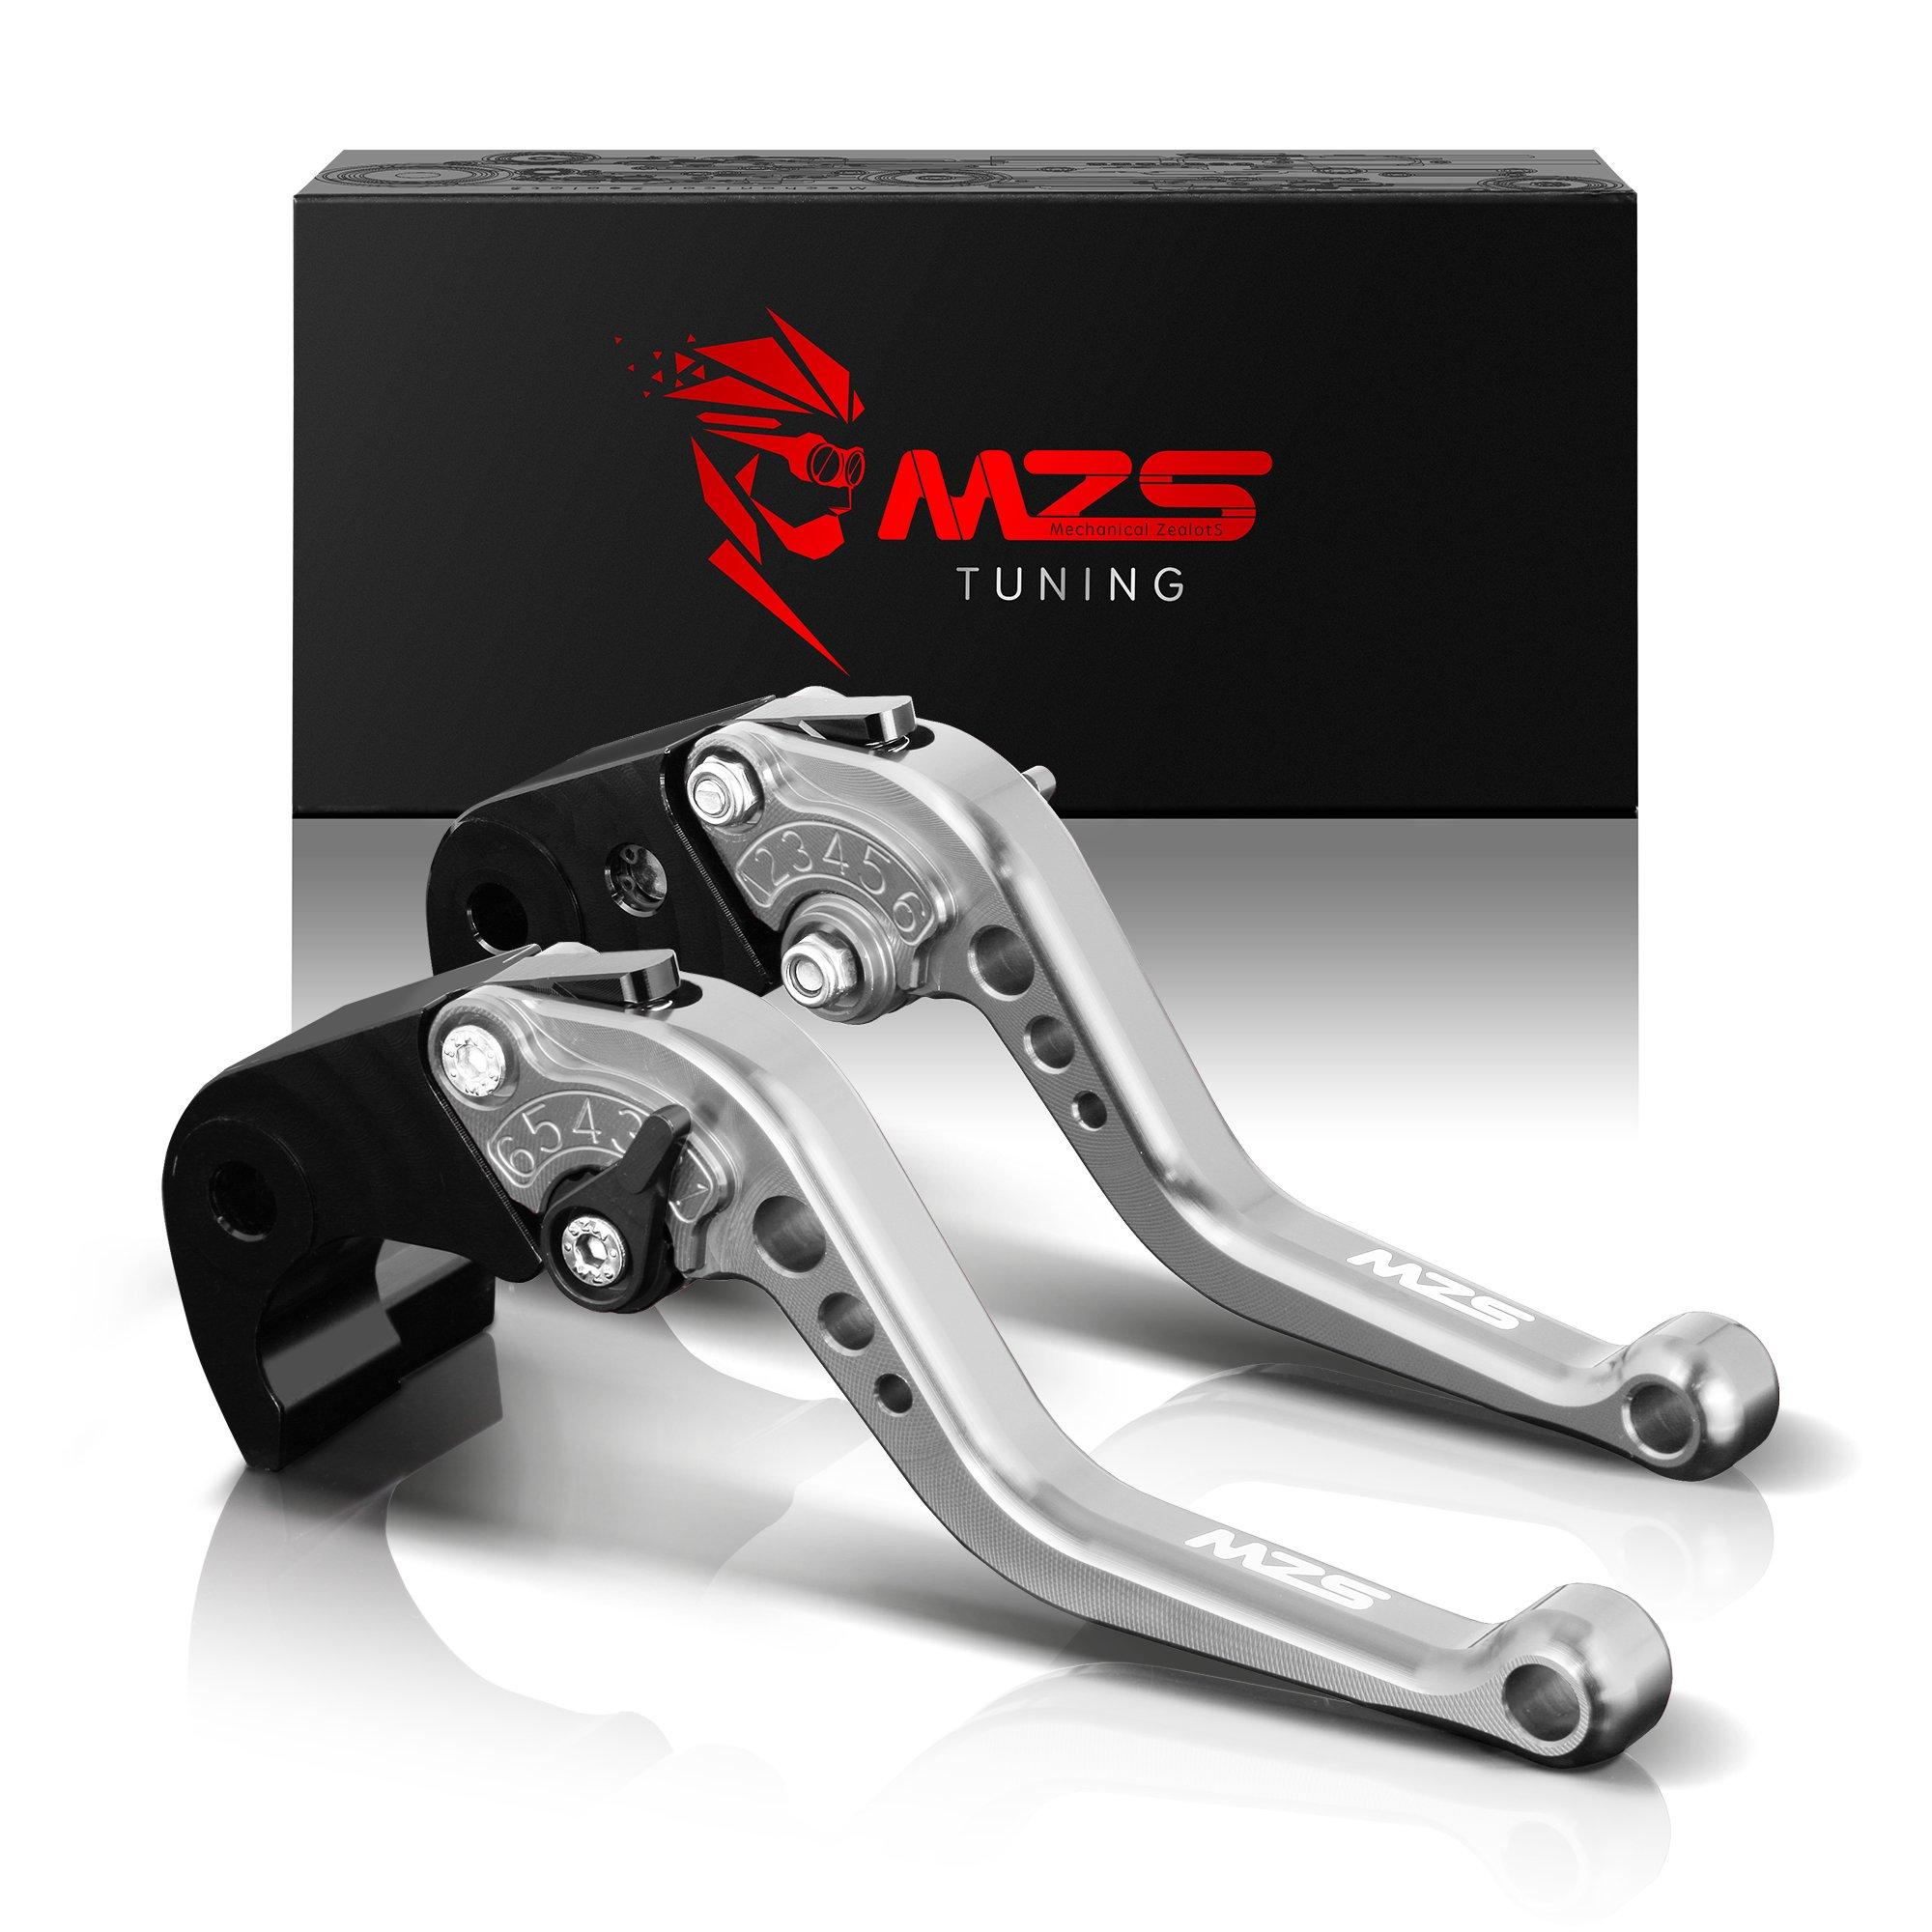 MZS Short Levers Brake Clutch CNC Silver compatible Kawasaki Ninja ZX10R ZX-10R 2004 2005